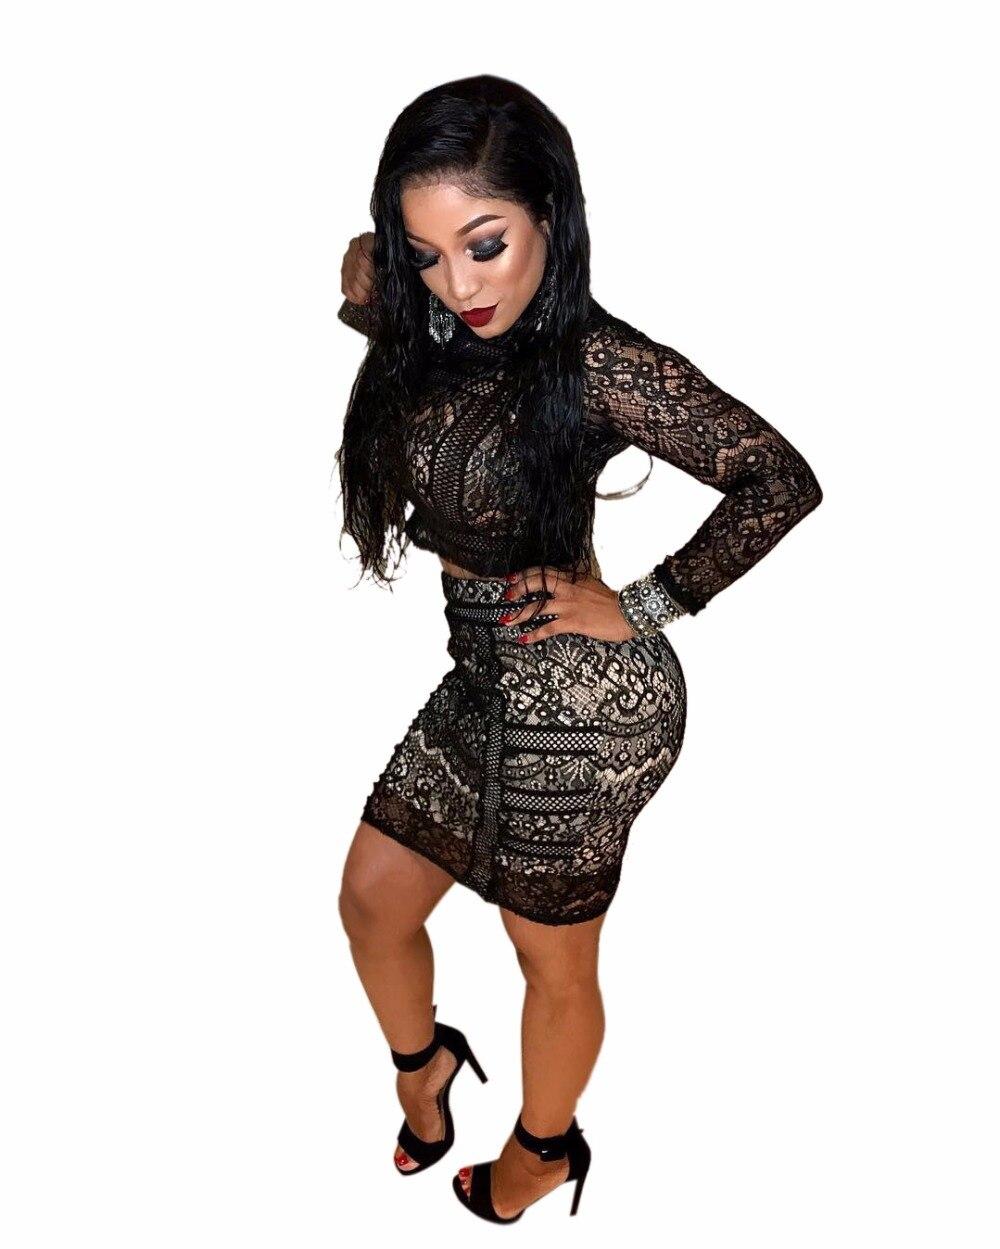 b1581ddc4261 Londinas Ark Store 2017 Black Lace Women Dress Two-Piece Set Fashion Outfits  Bandage Hollow